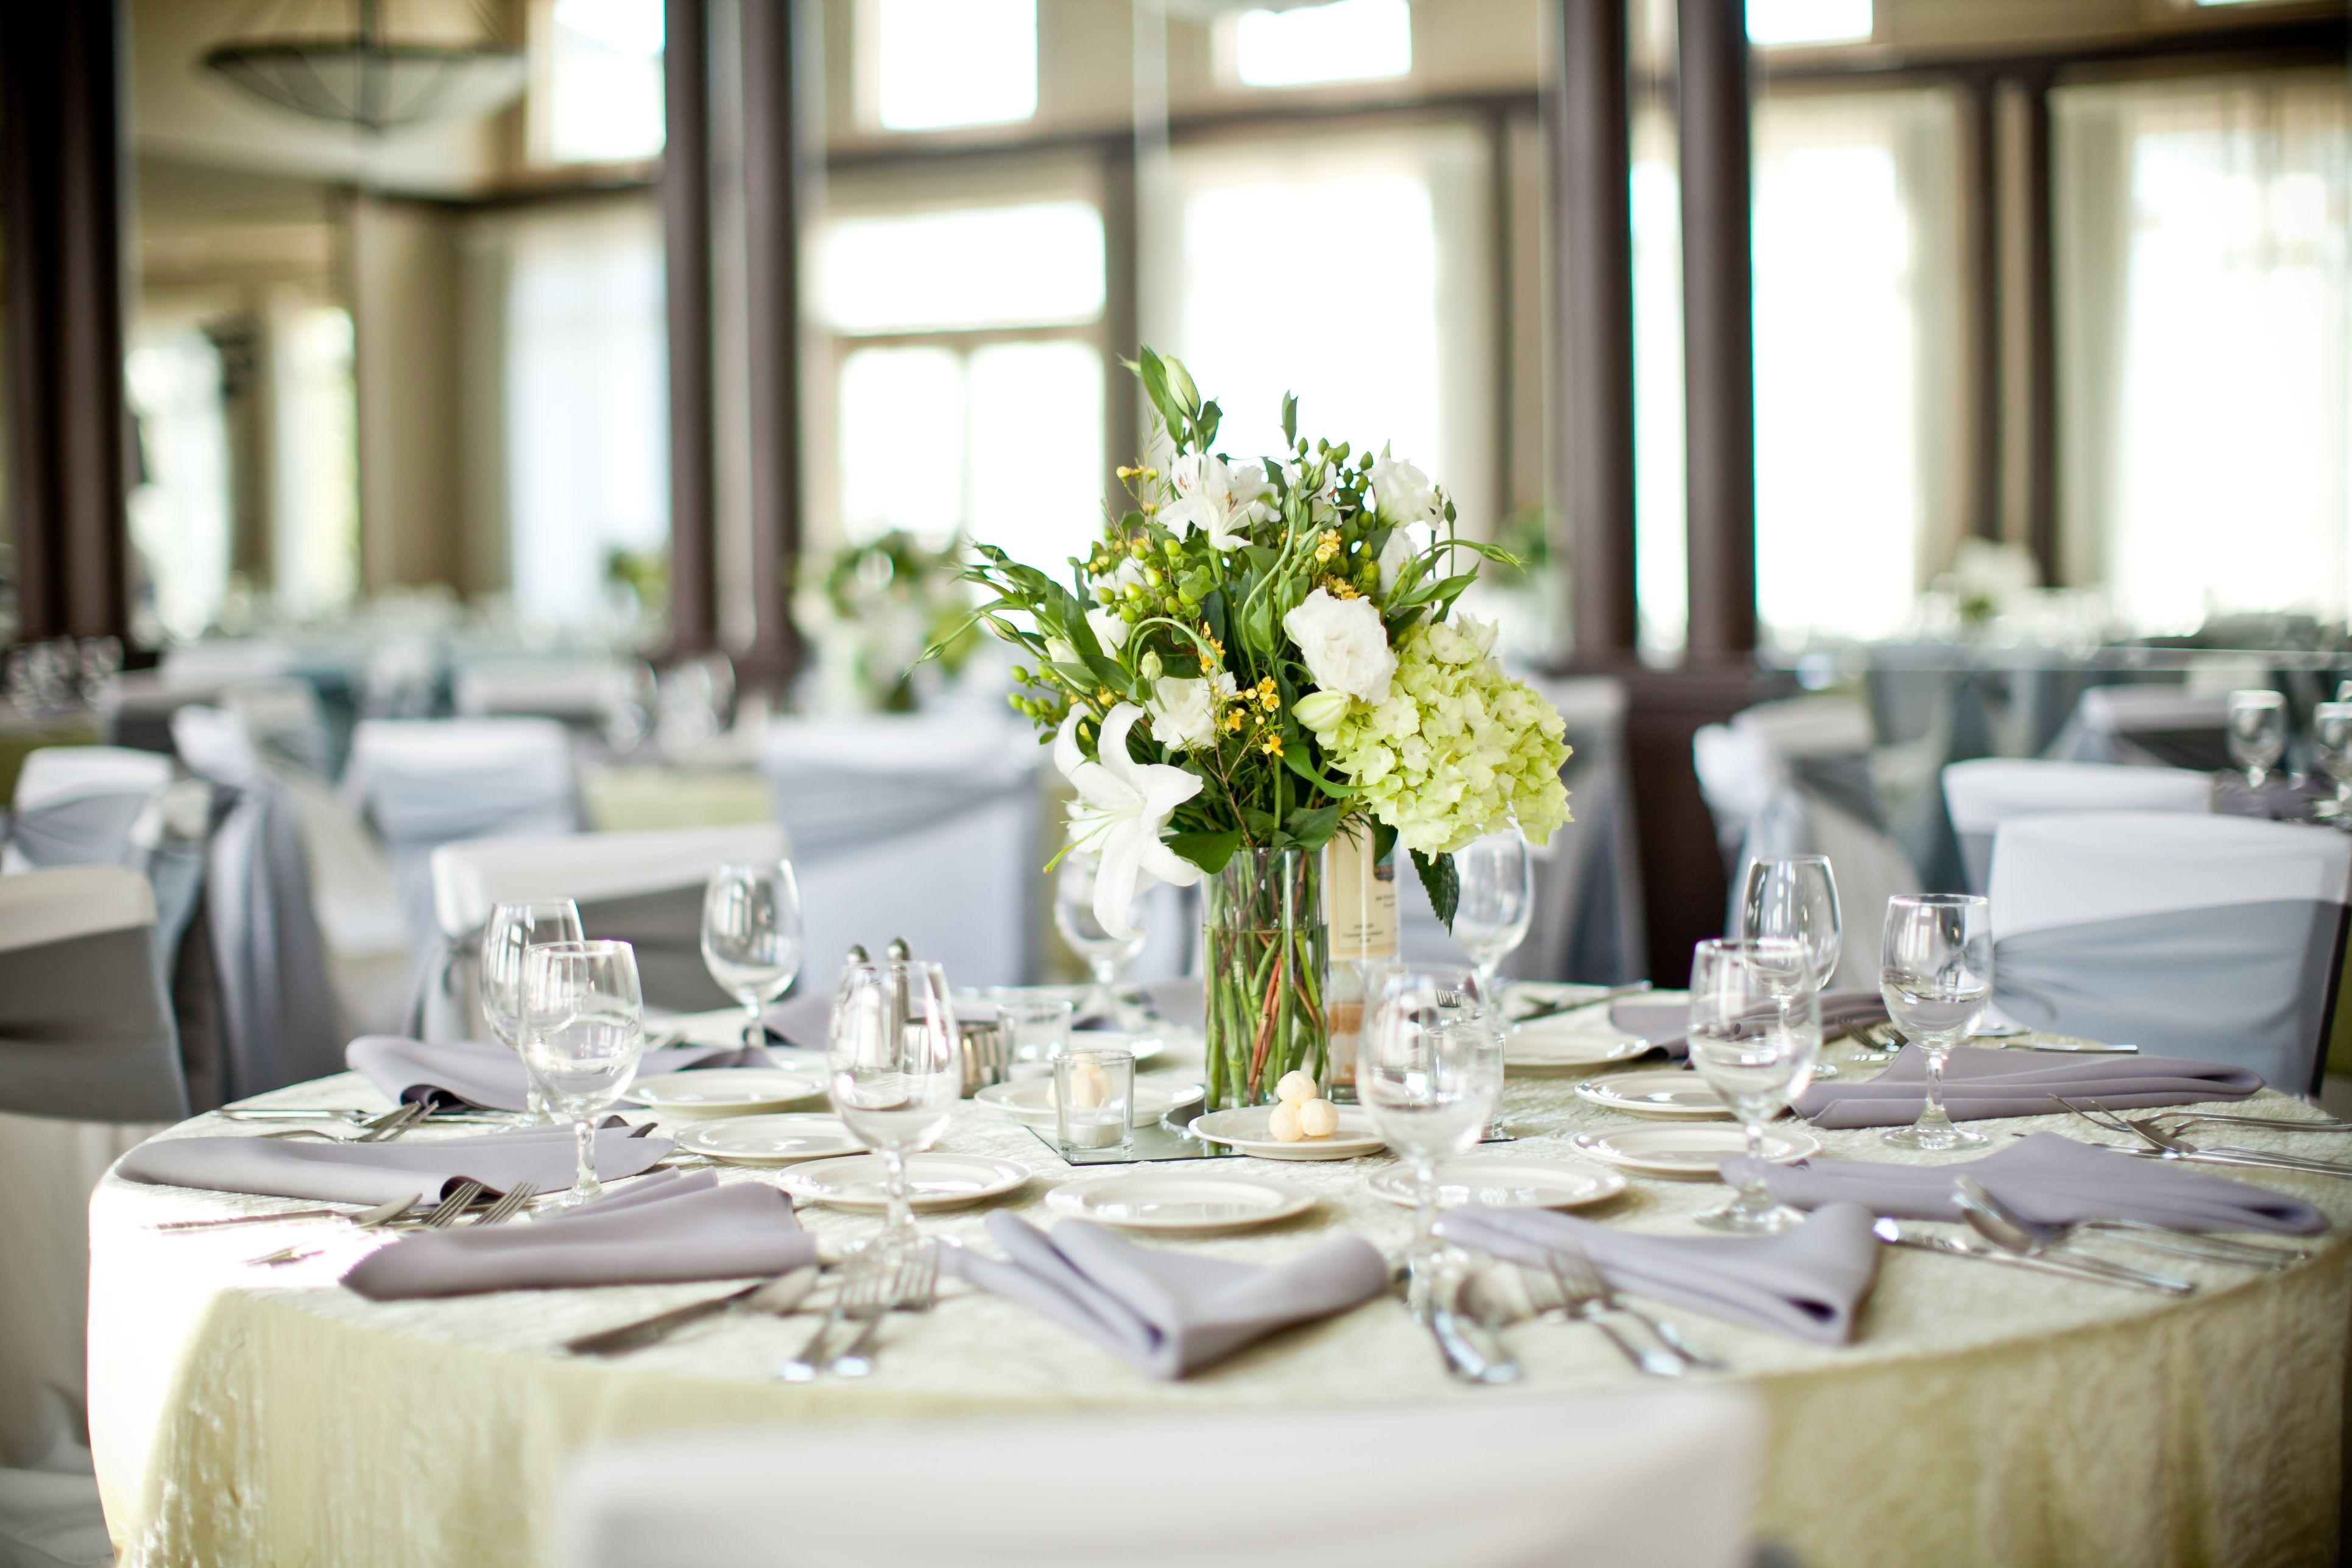 A Fresh Ballroom in Shades of Green @HawthornsEvents